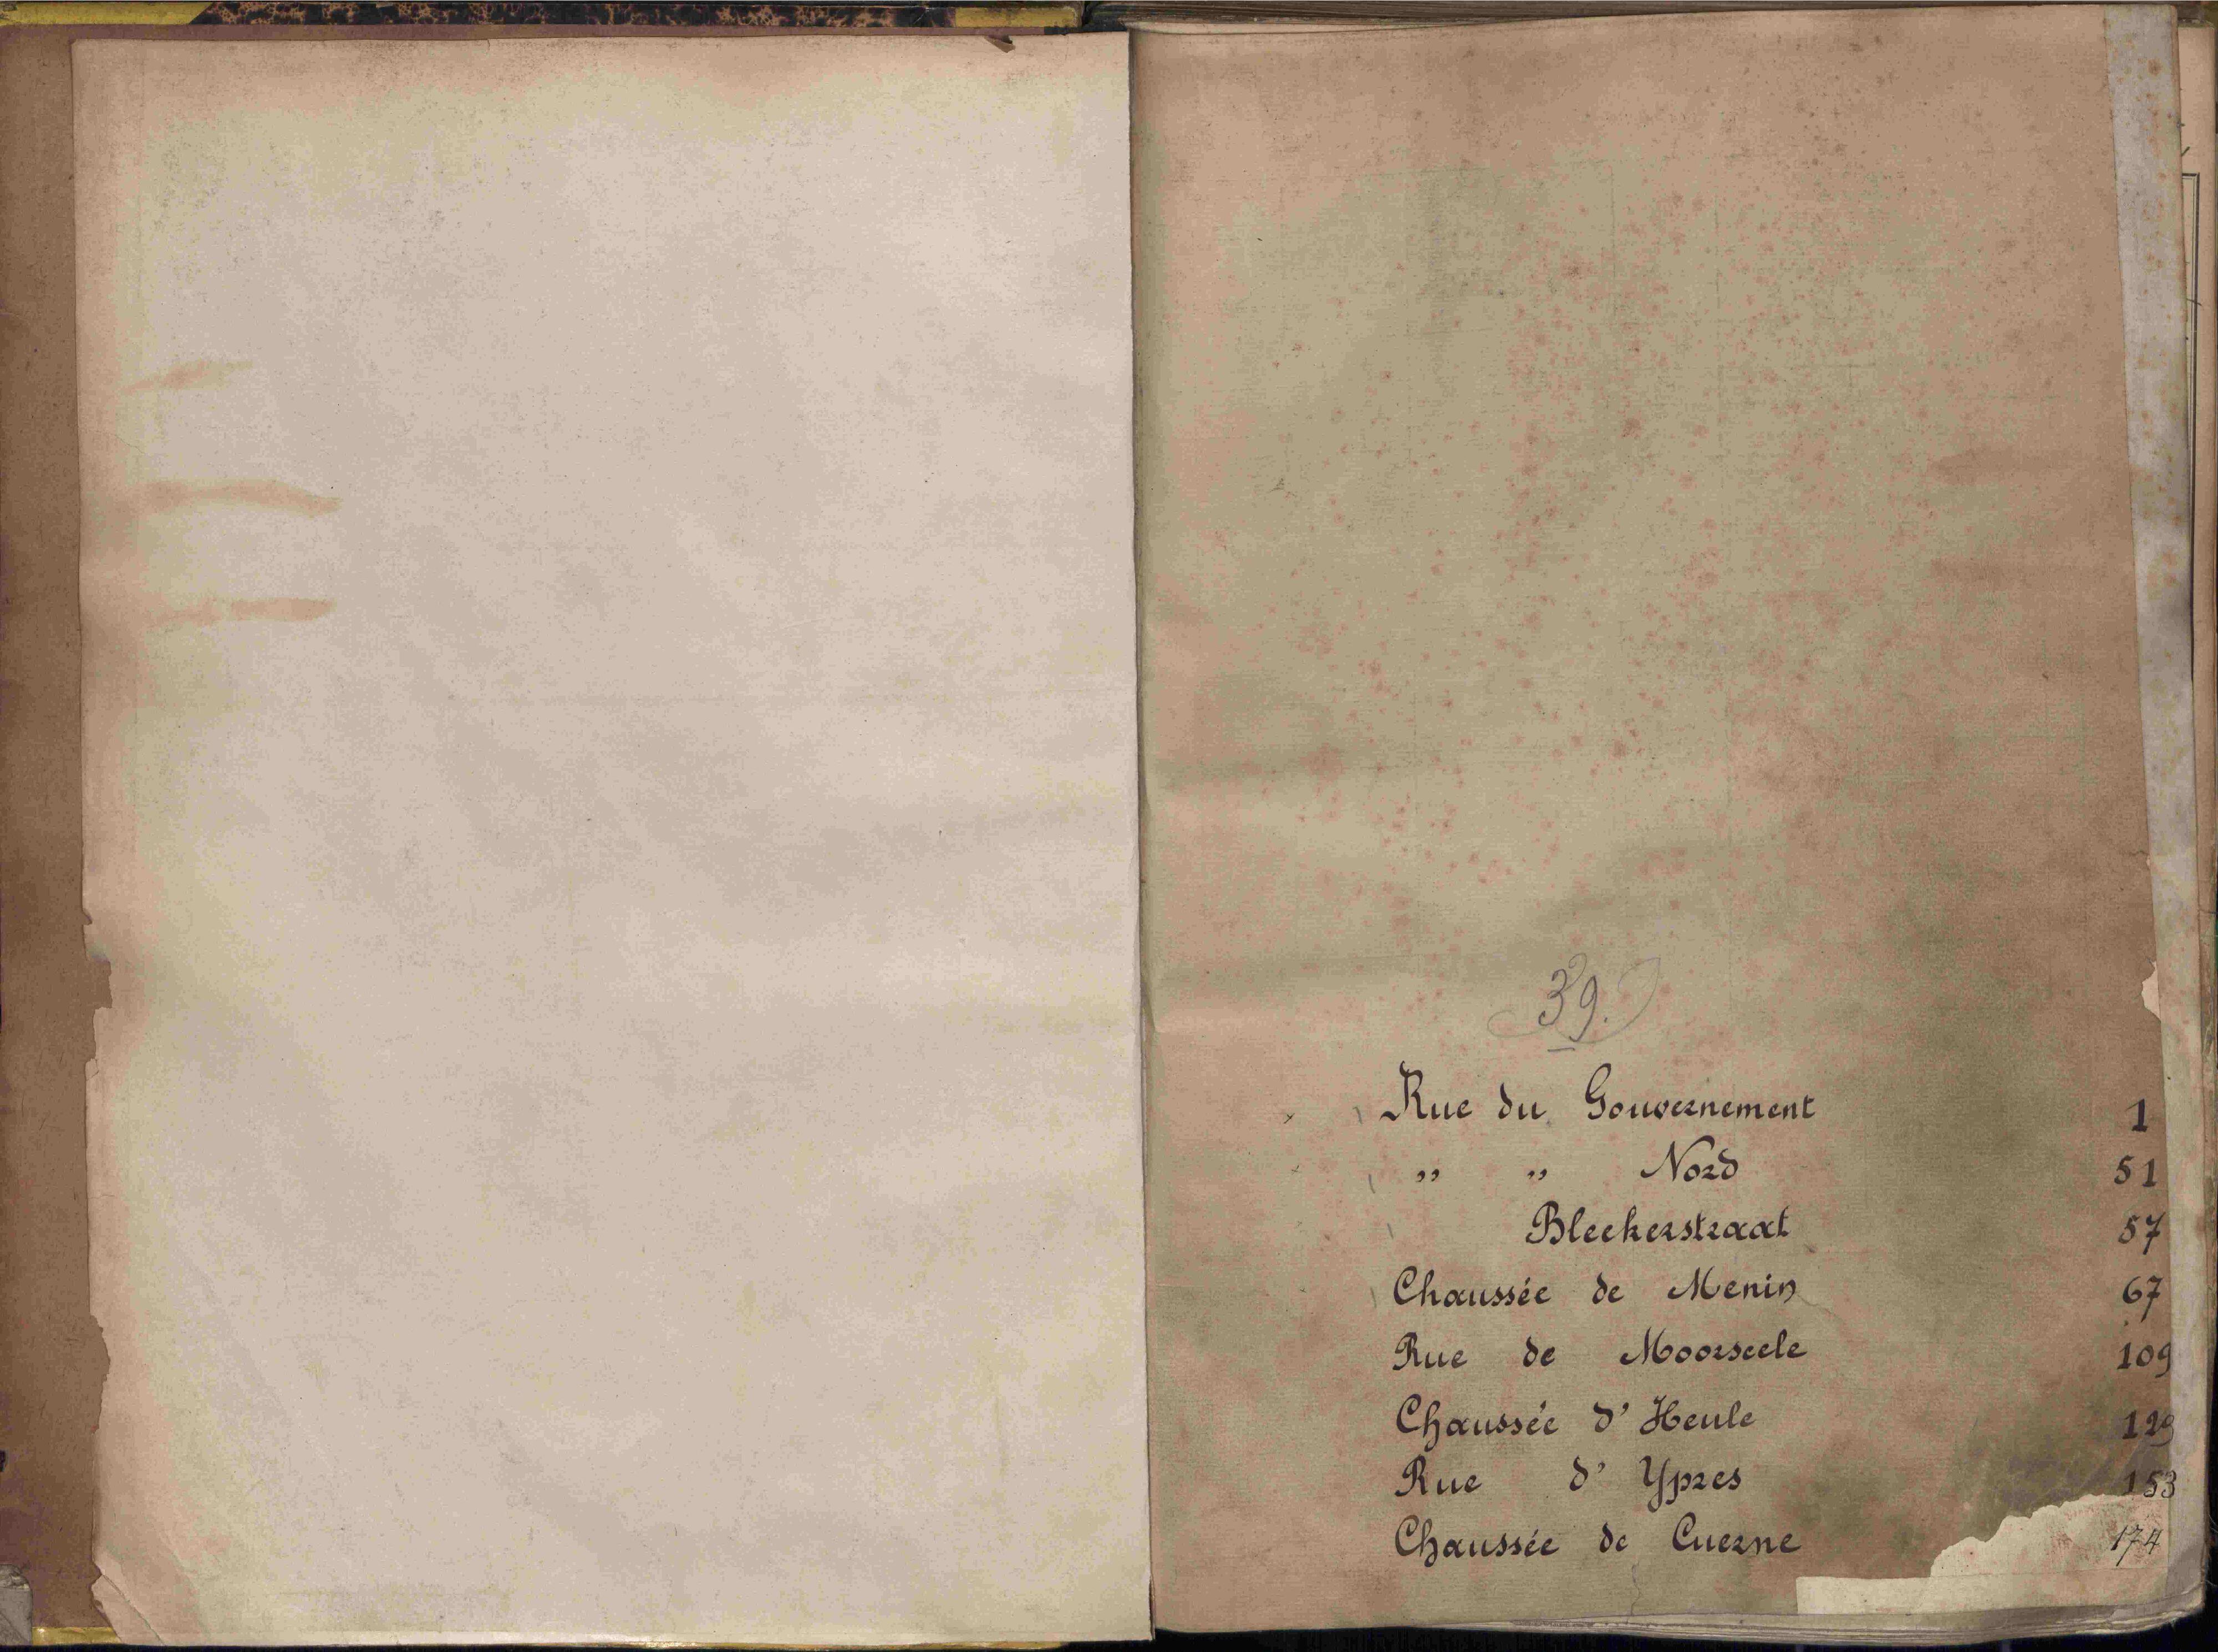 Bevolkingsregister Kortrijk 1890 boek 39